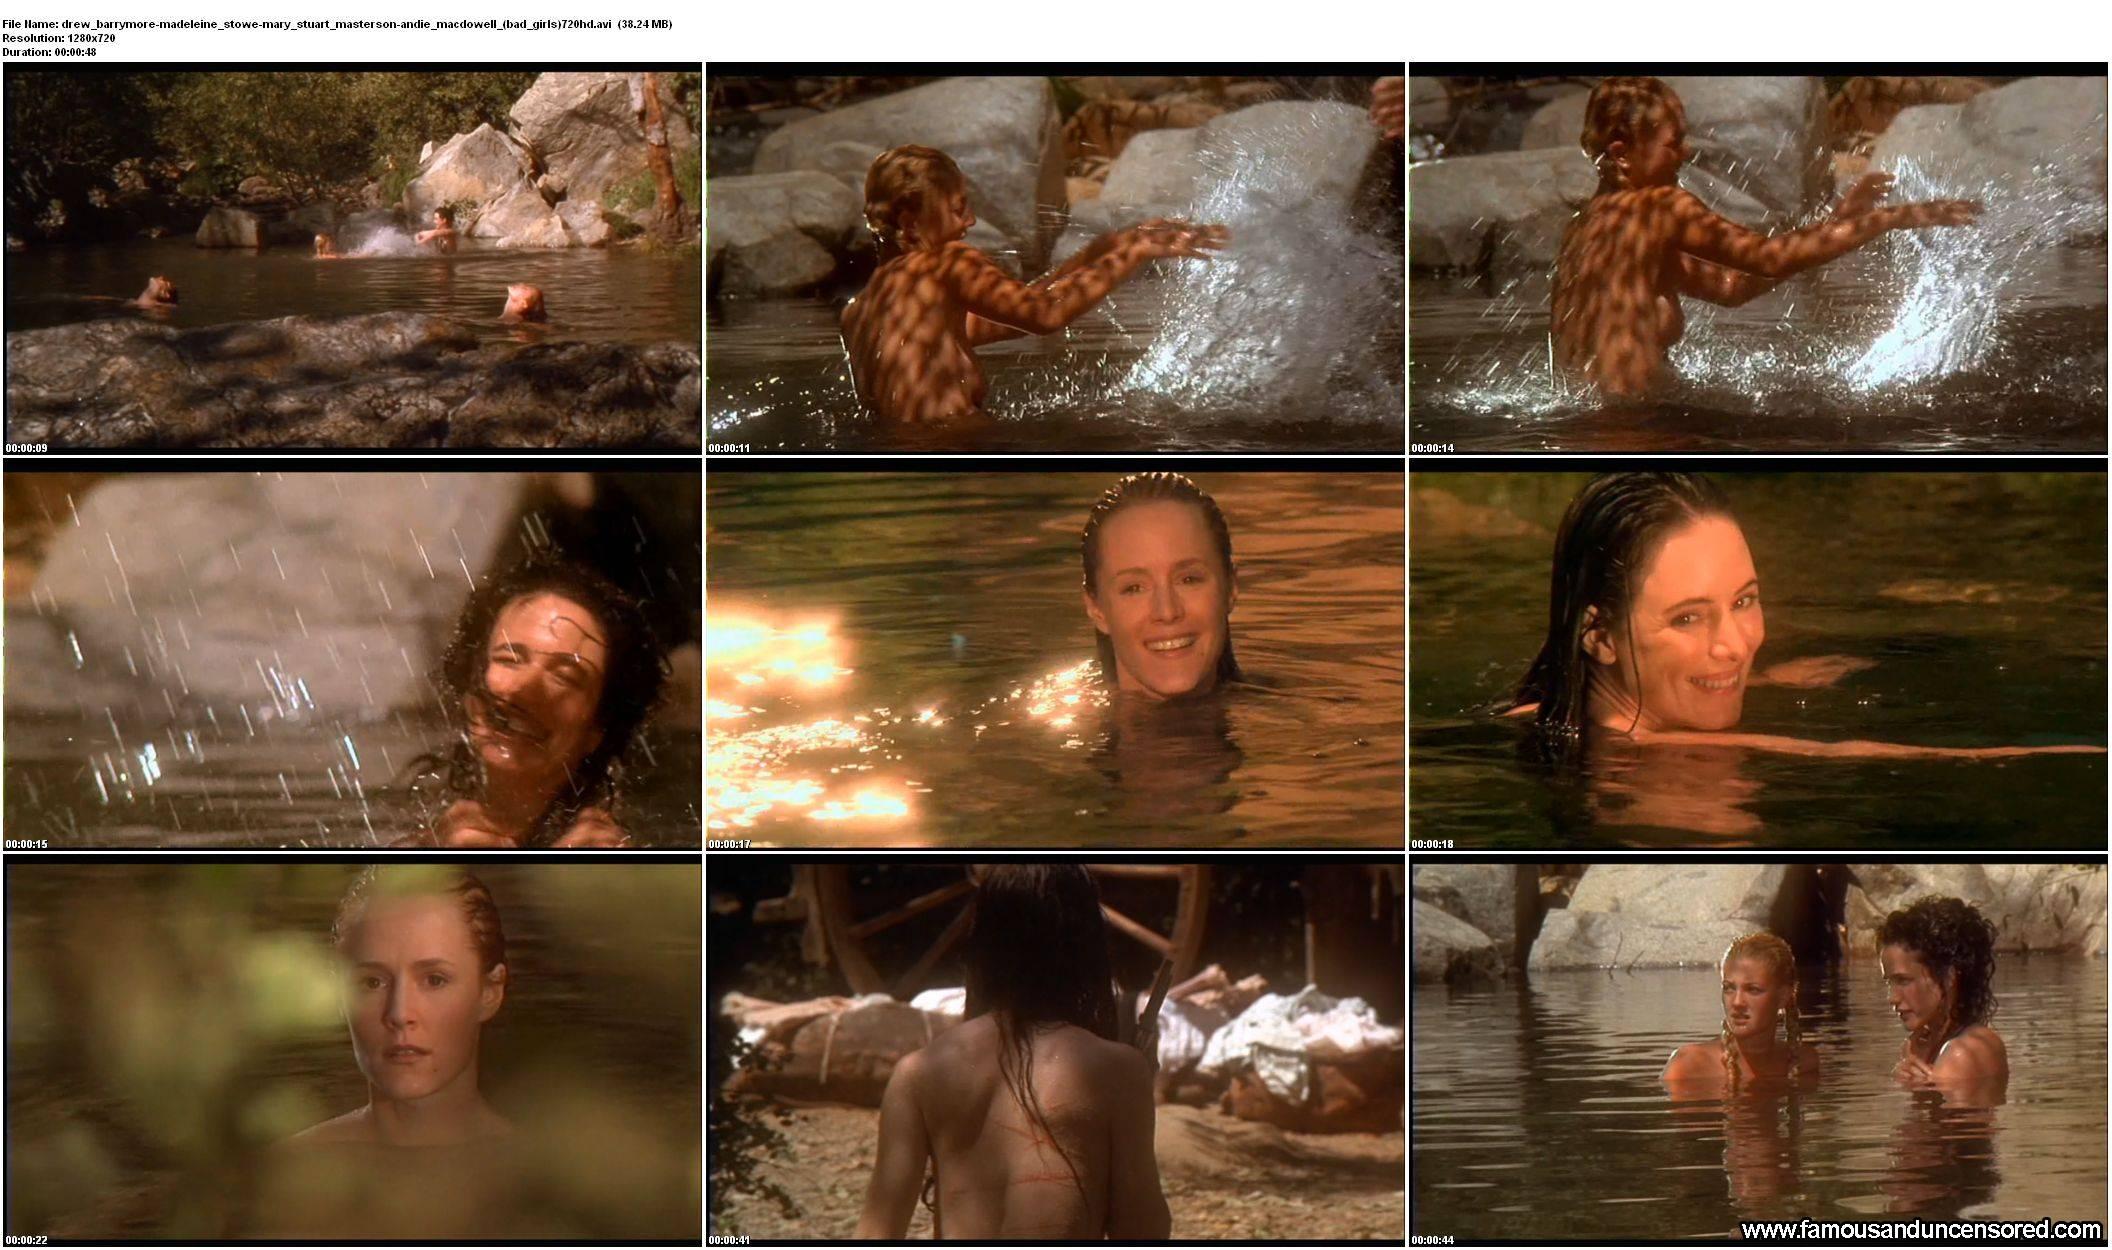 Mary Stuart Masterson desnuda Imgenes, vdeos y